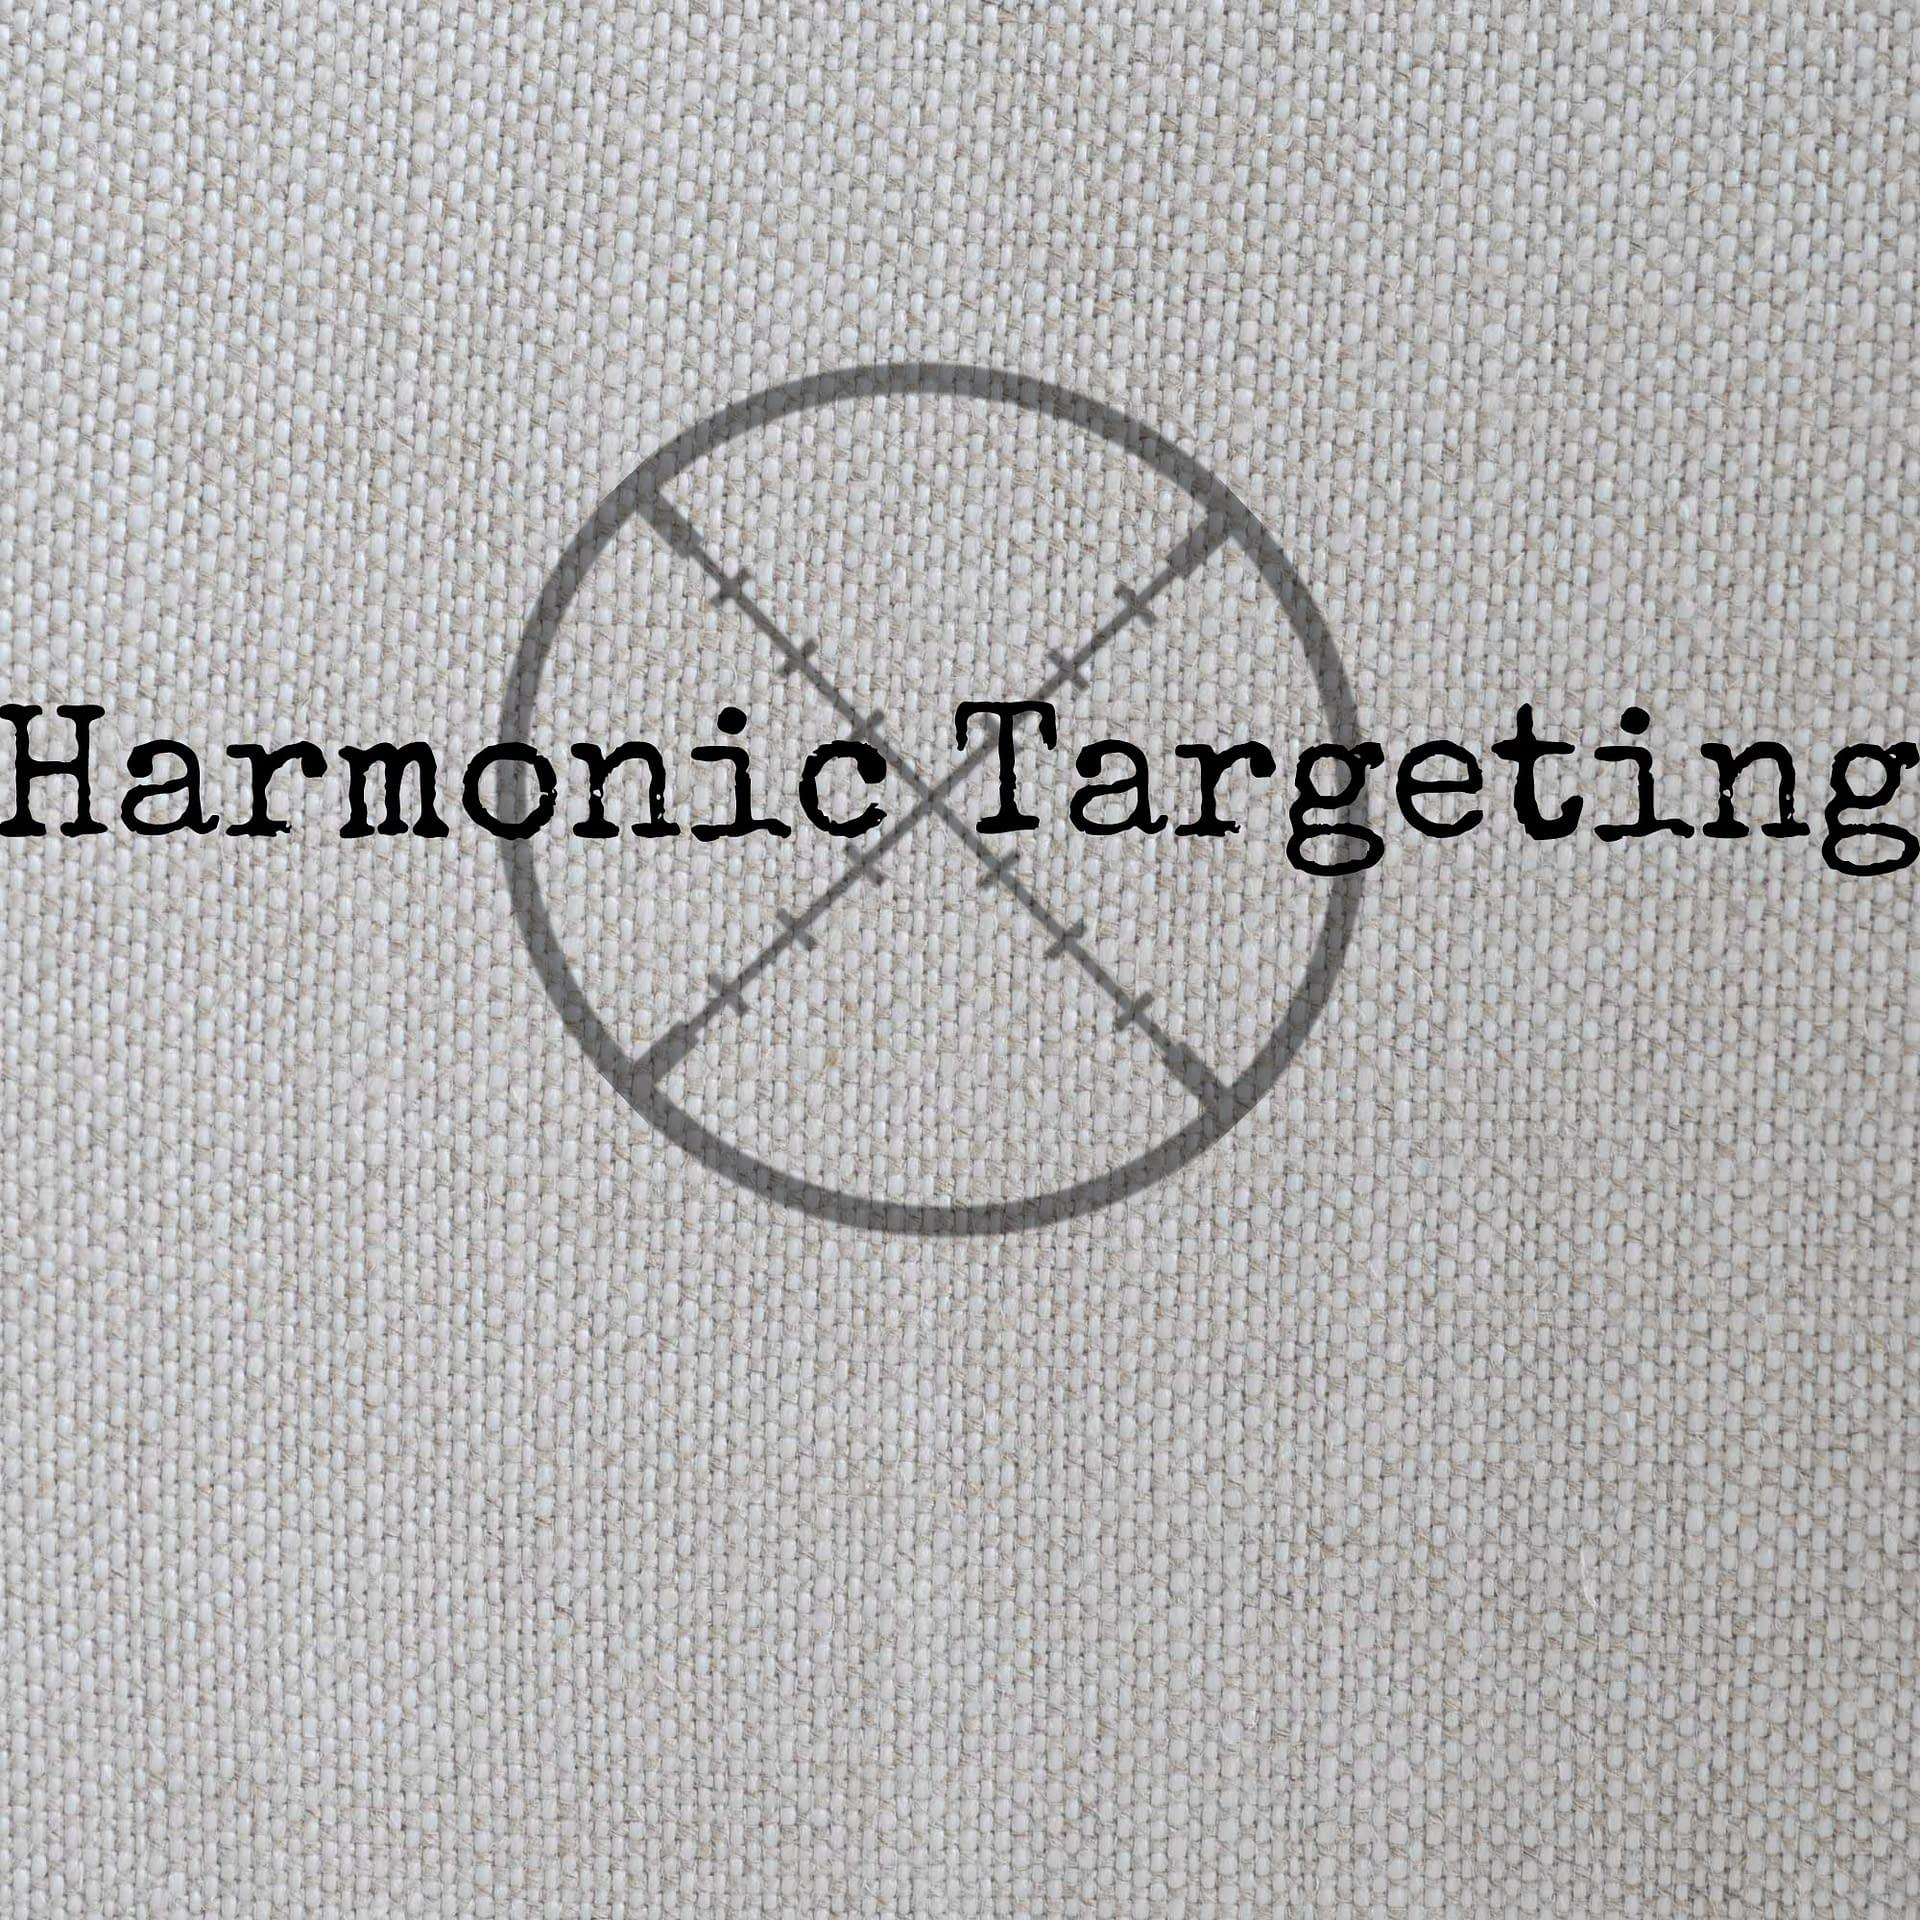 Harmonic Targeting